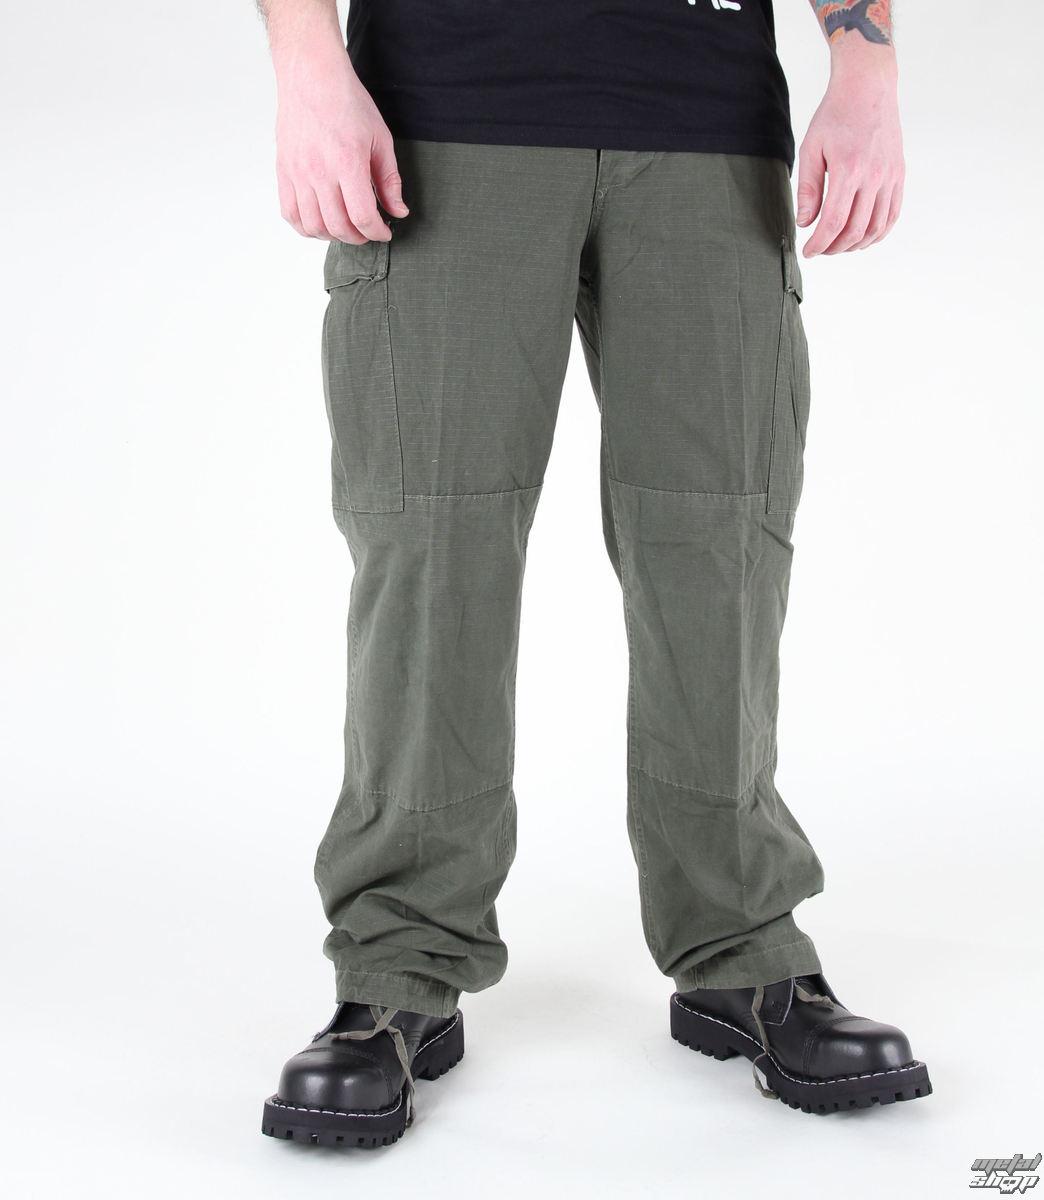 kalhoty pánské MIL-TEC - US Feldhose - CO Prewash Oliv - 11821001